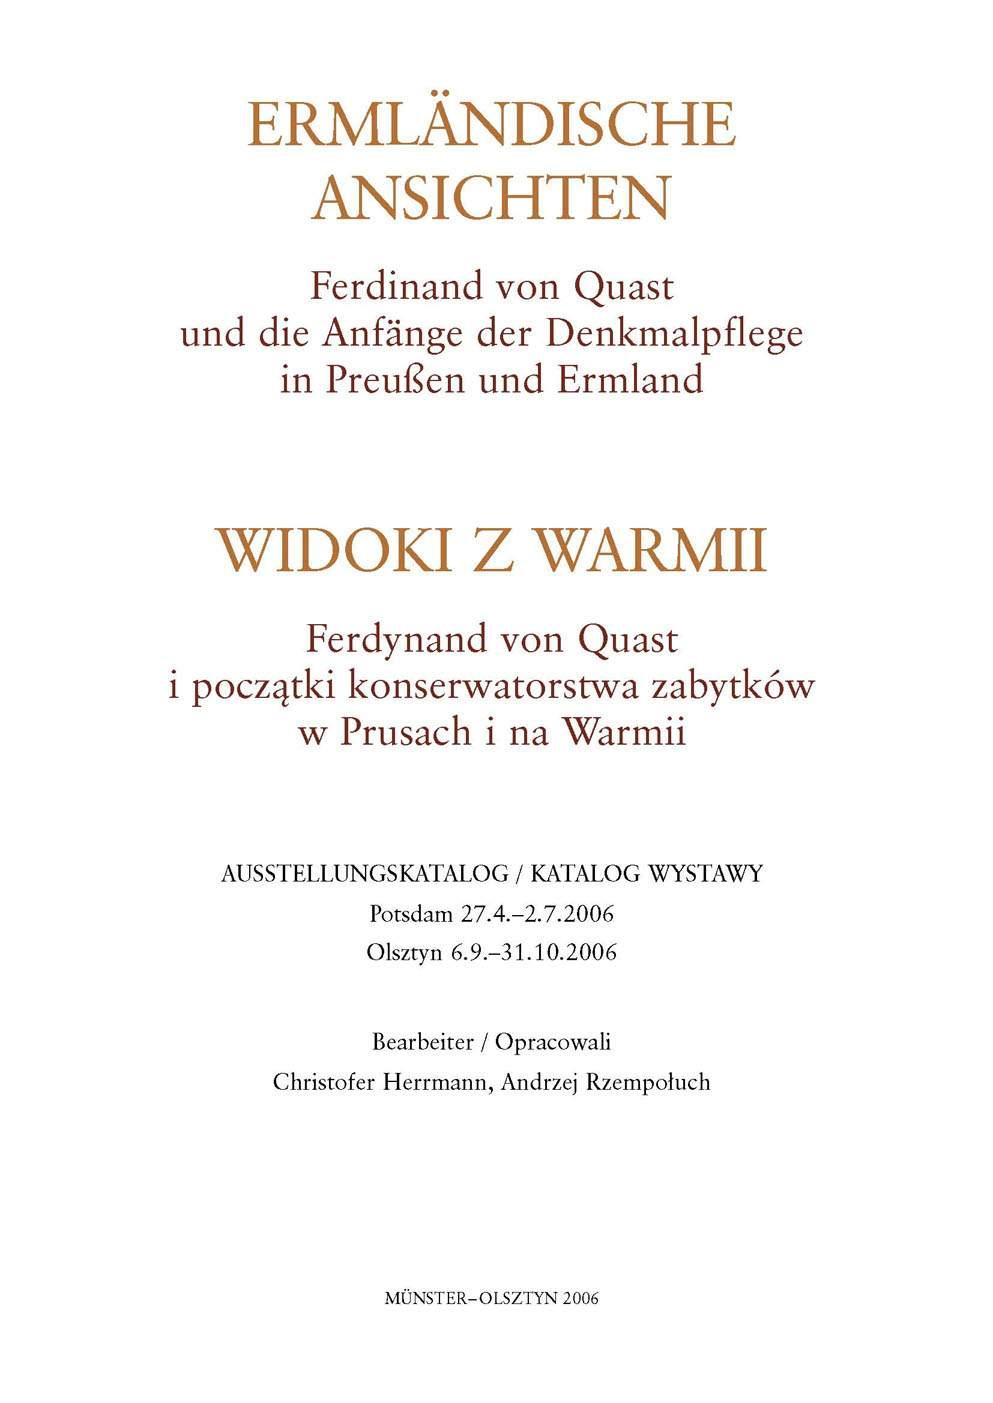 https://m.wmwm.pl/2015/04/orig/z-25-iv-08-quast-tytulowa-4181.jpg